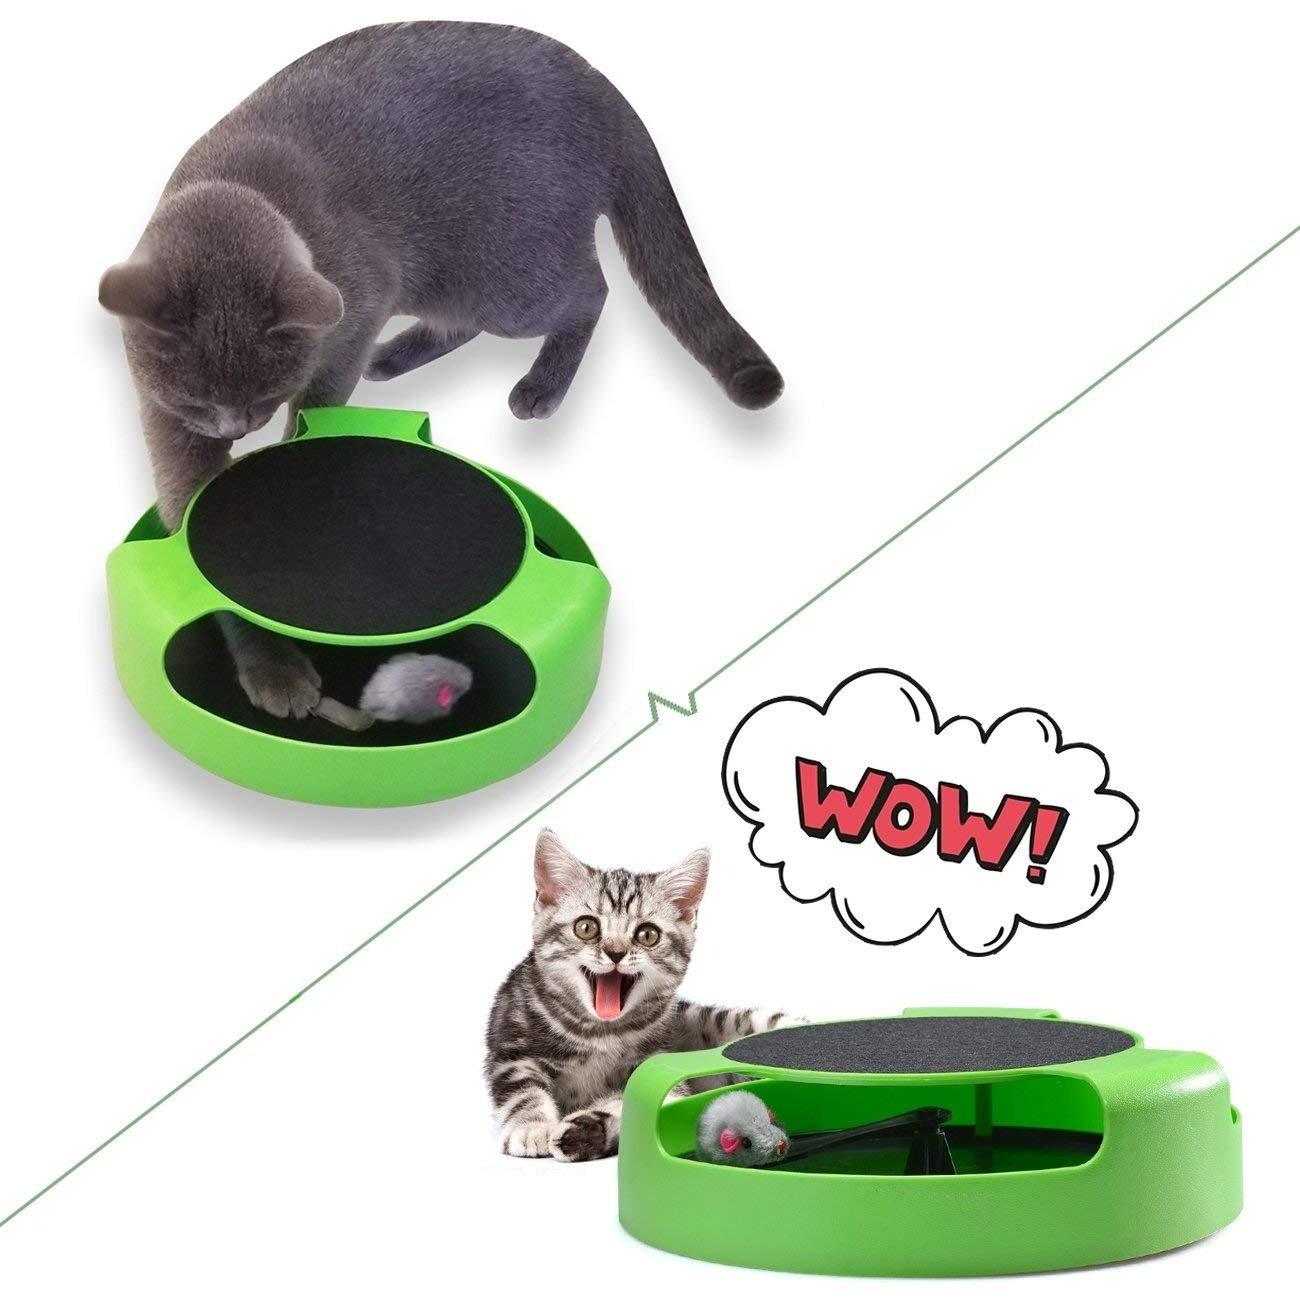 Cat Interactive Toy (Cat Scratching Pad) - Unnati Enterprises